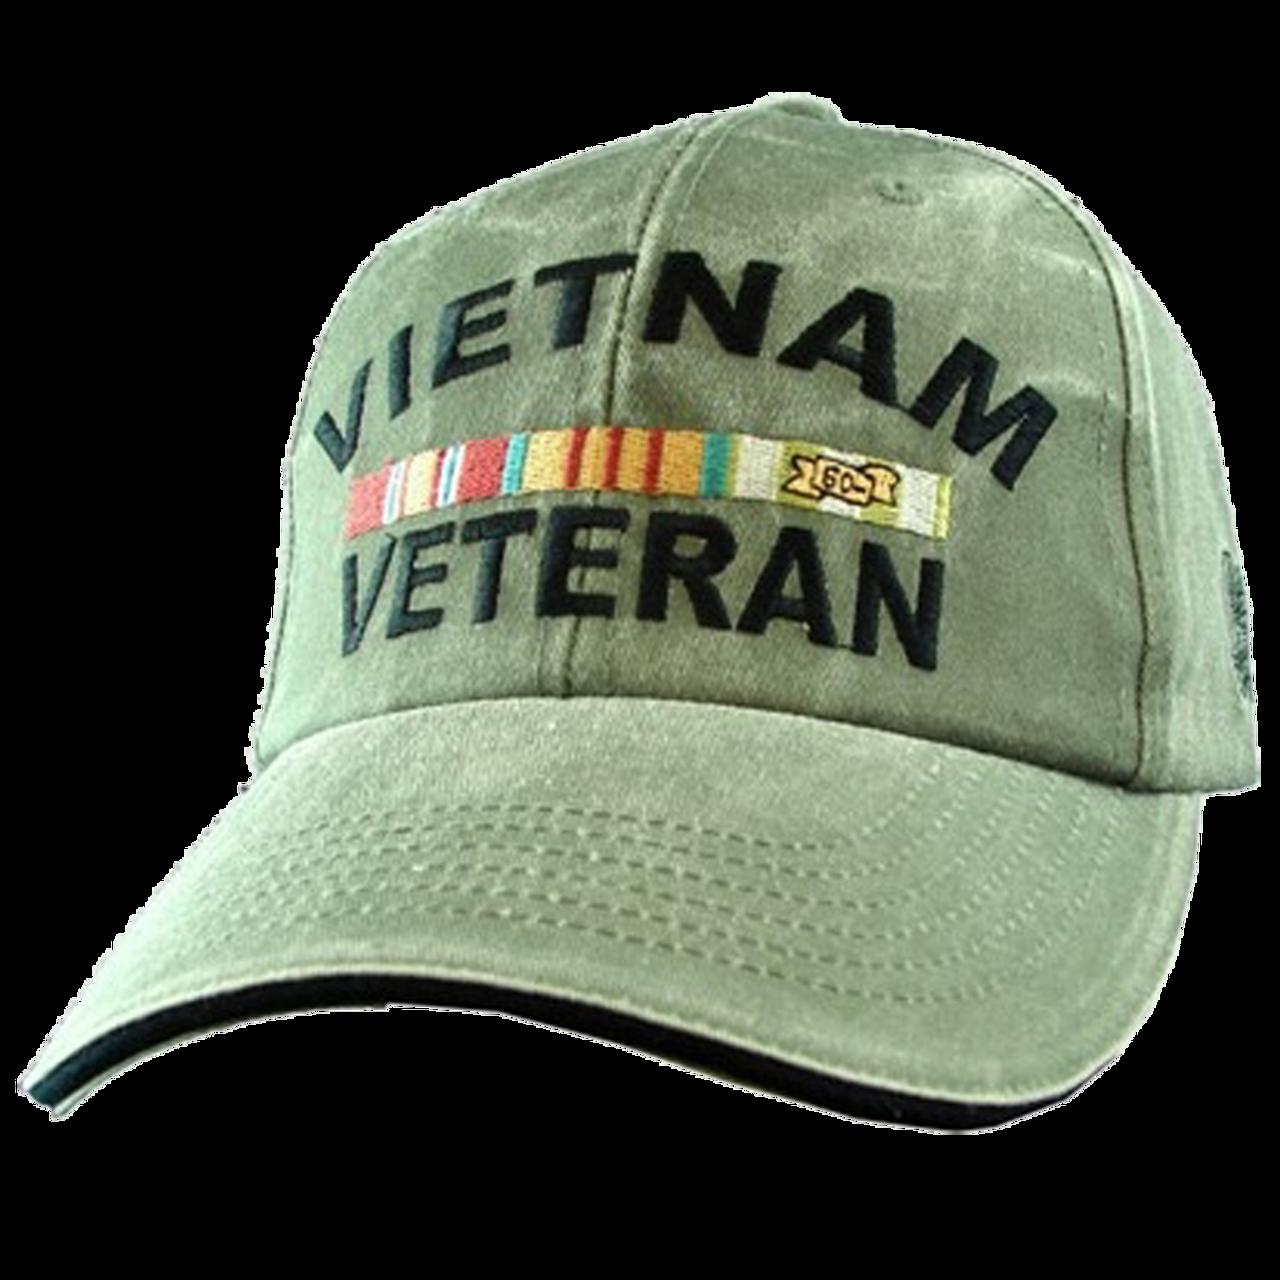 b6e44e4a379a6 Eagle Crest 5627 - Vietnam Veteran Cap - Cotton - OD Green